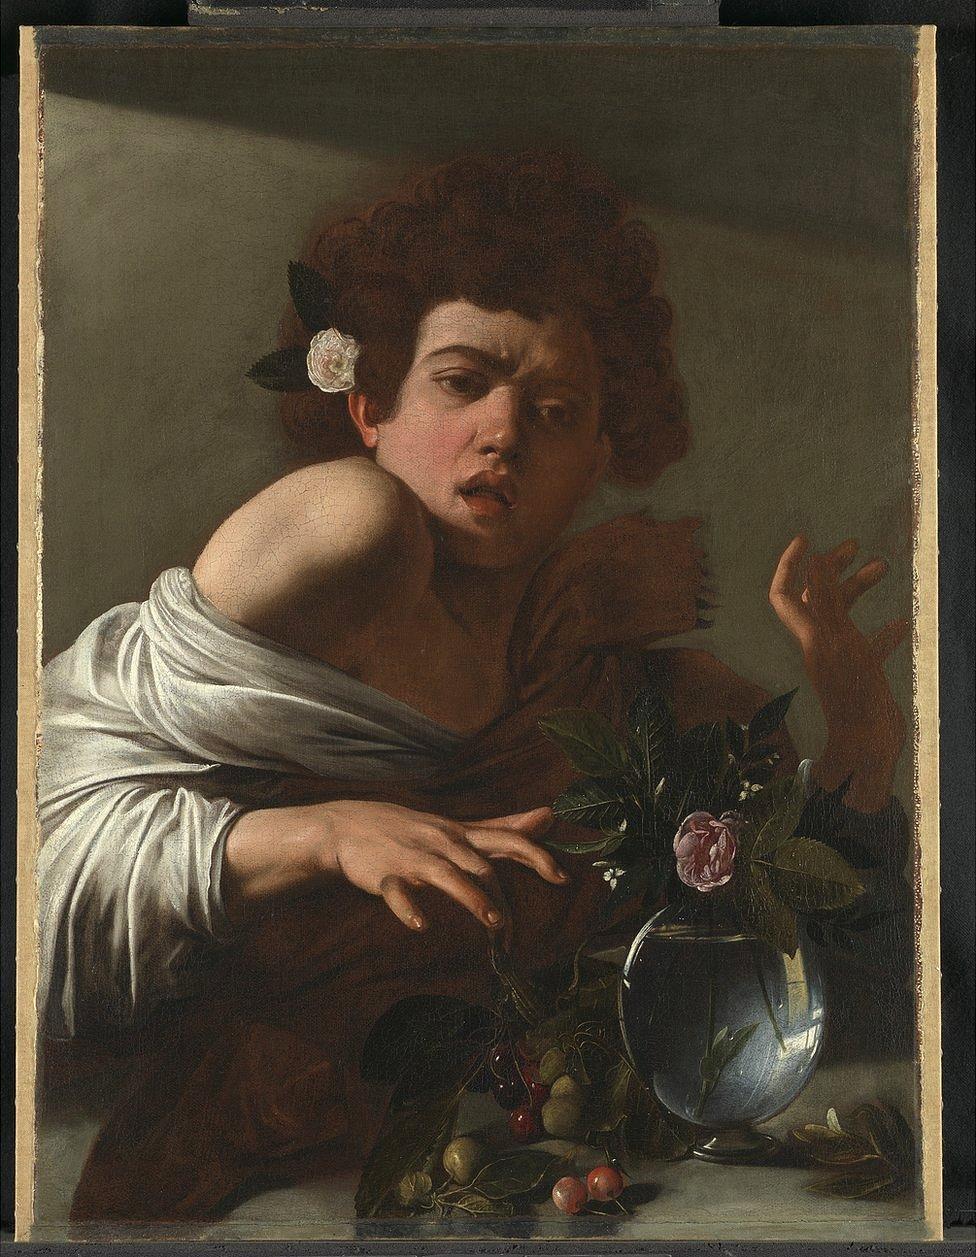 Boy Bitten by a Lizard by Caravaggio